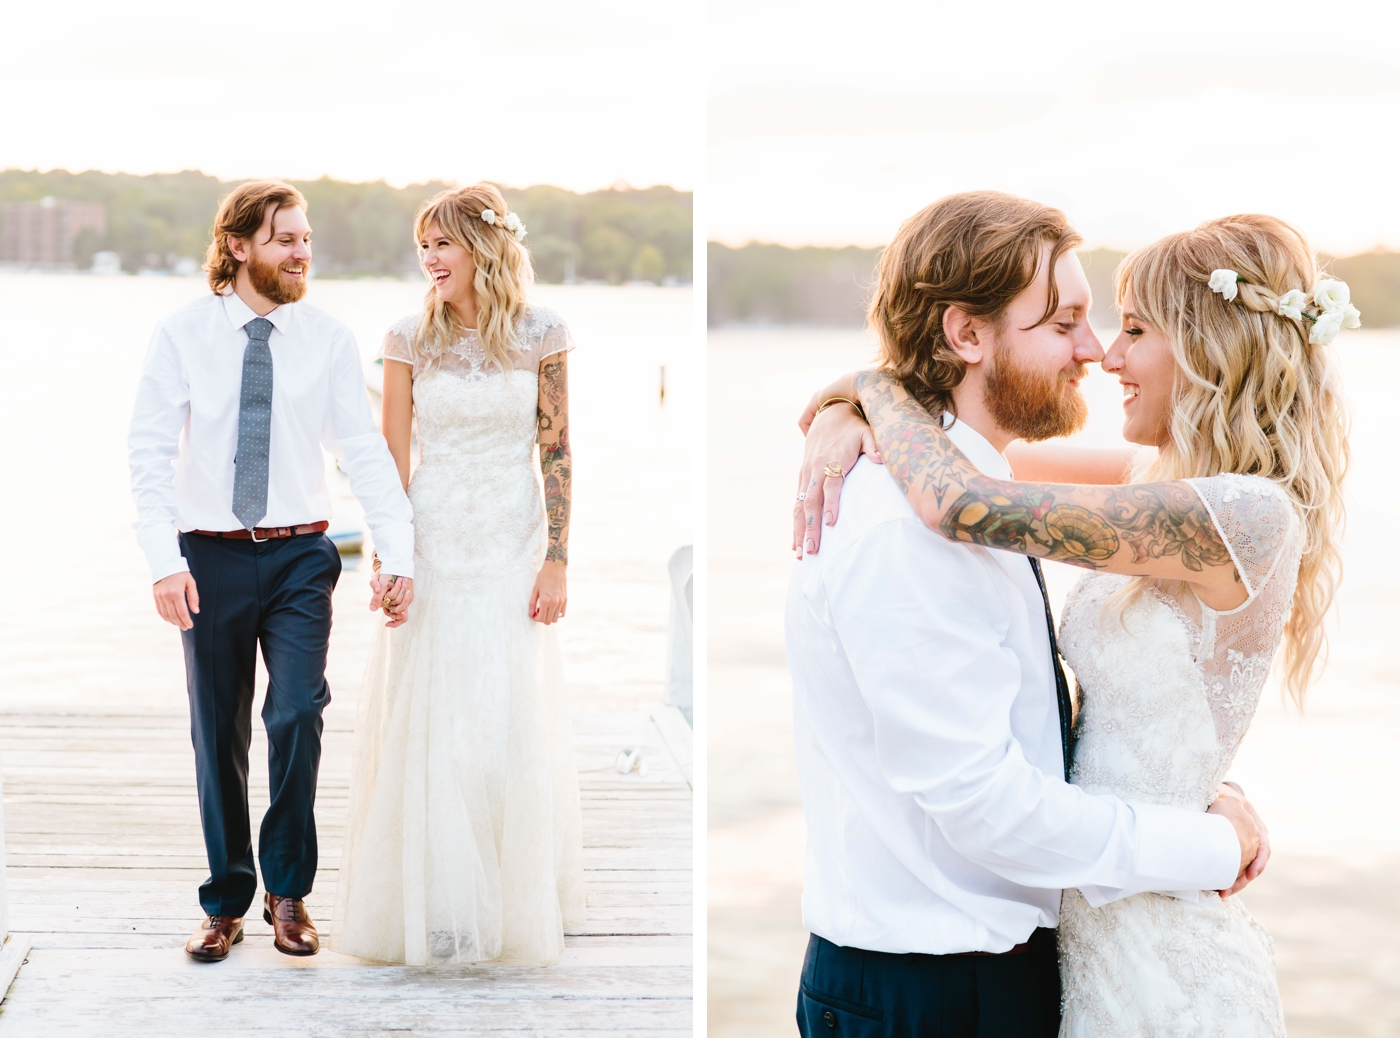 chicago-fine-art-wedding-photography-chriskelsey48